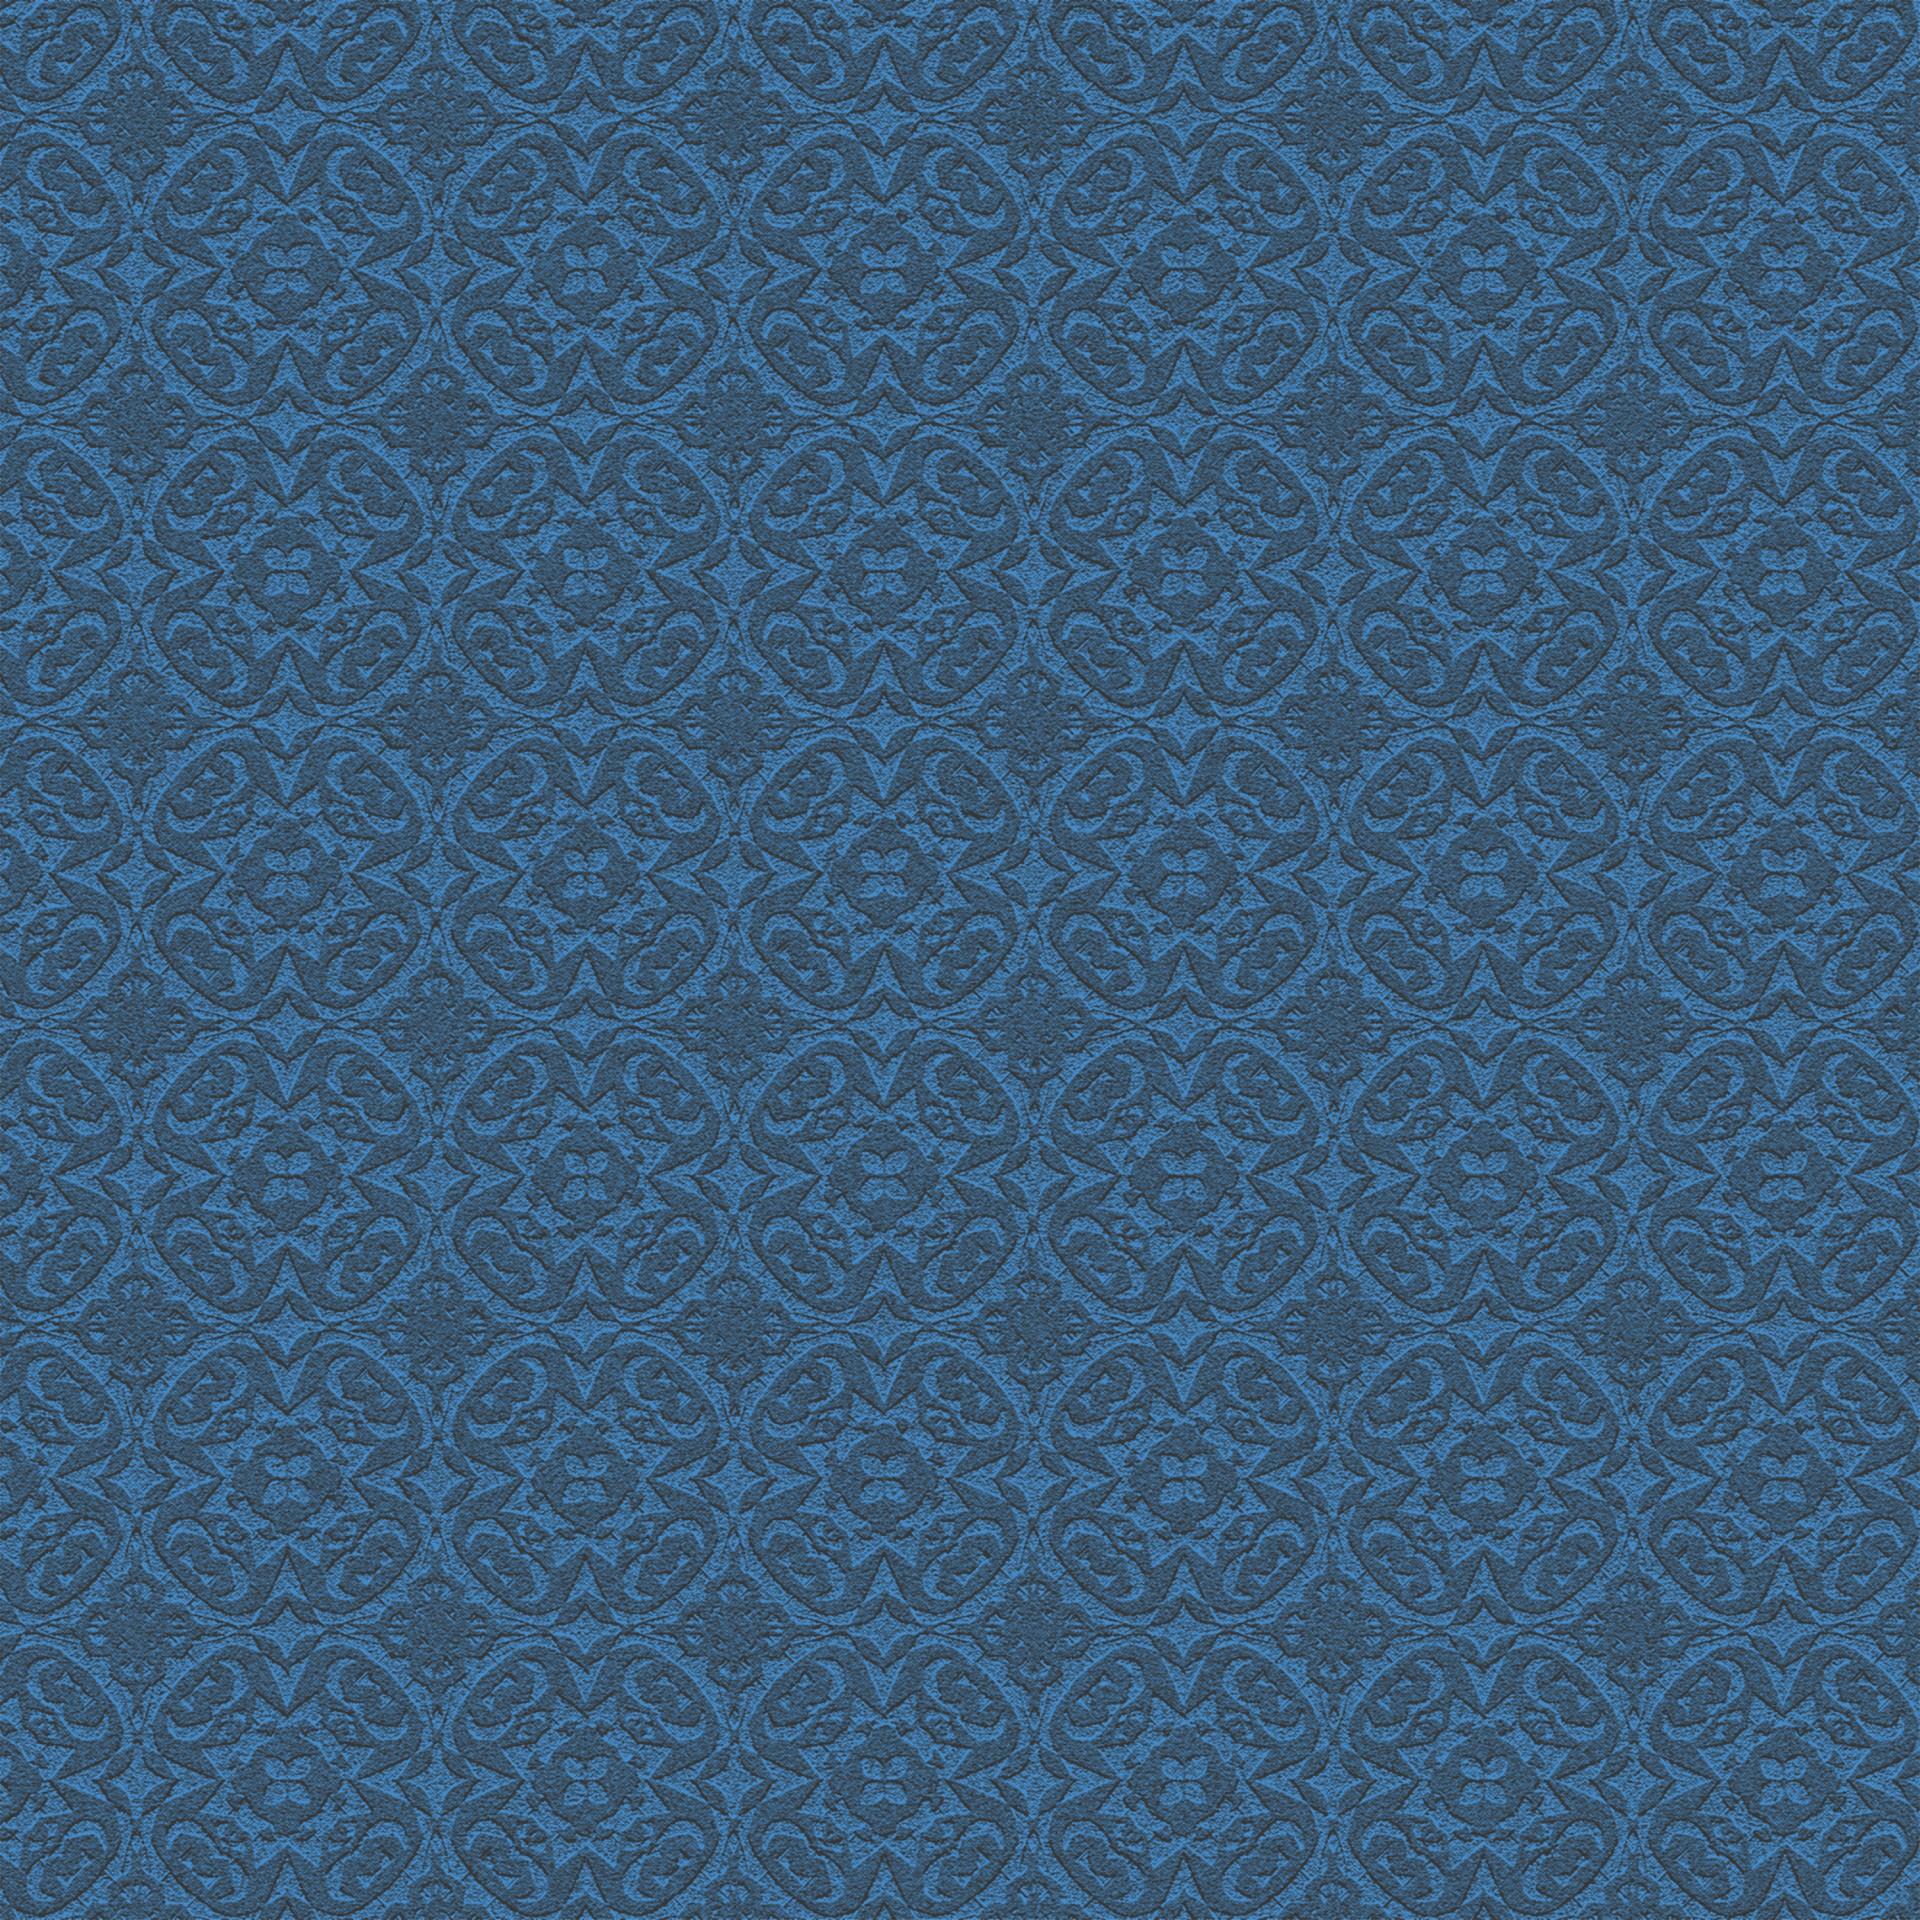 Pattern Blue Elegant Wallpaper Background Free Image From